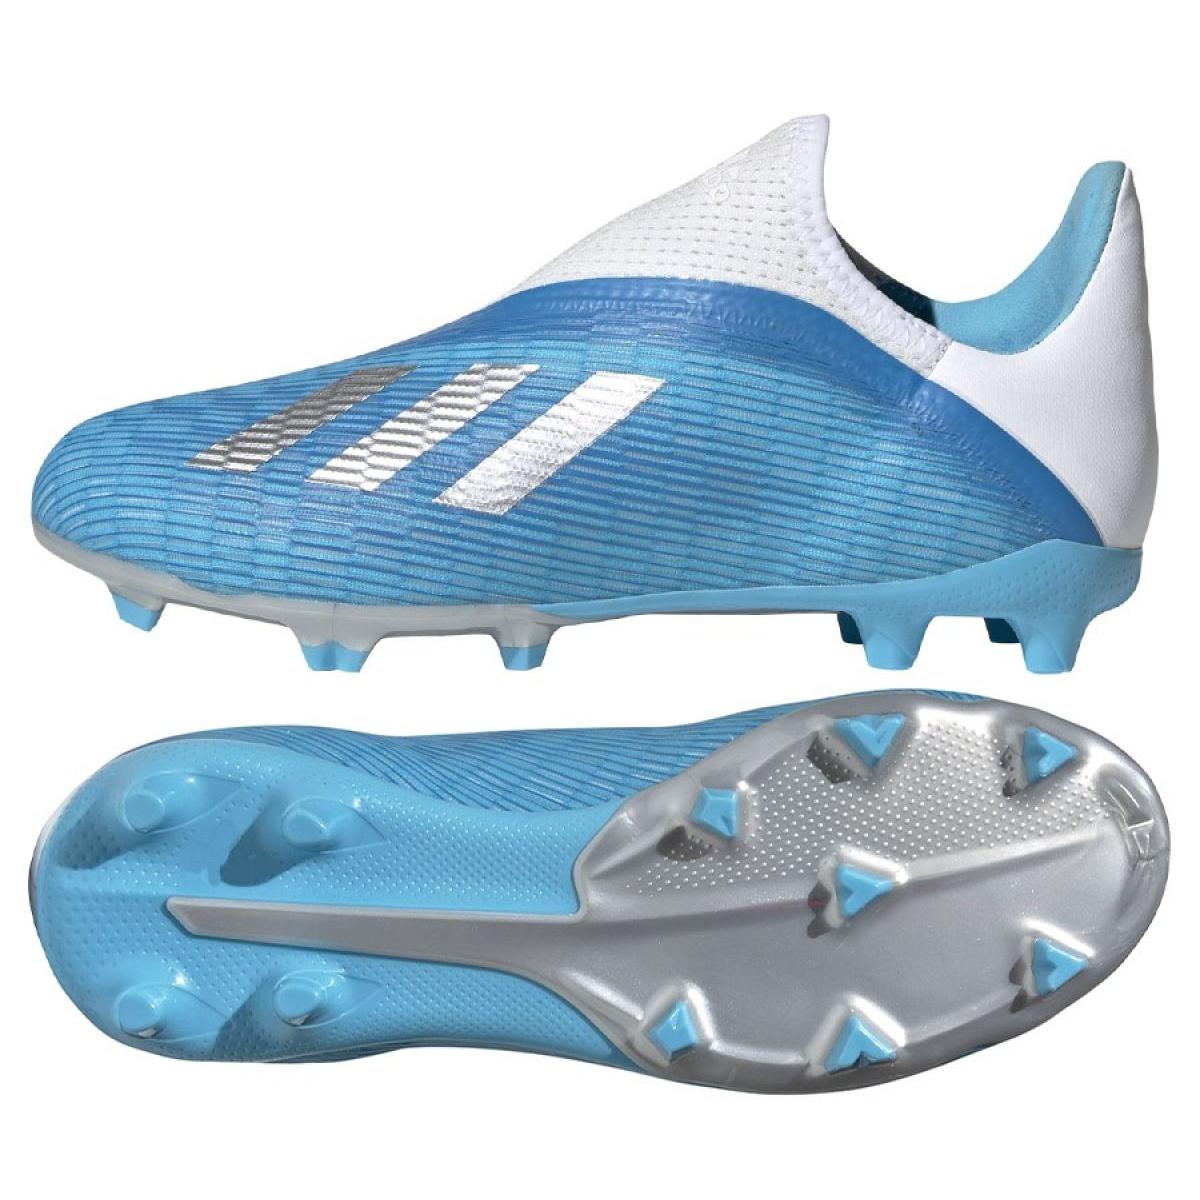 Details about Football shoes adidas X 19.3 Ll Fg Jr EF9114 blue blue